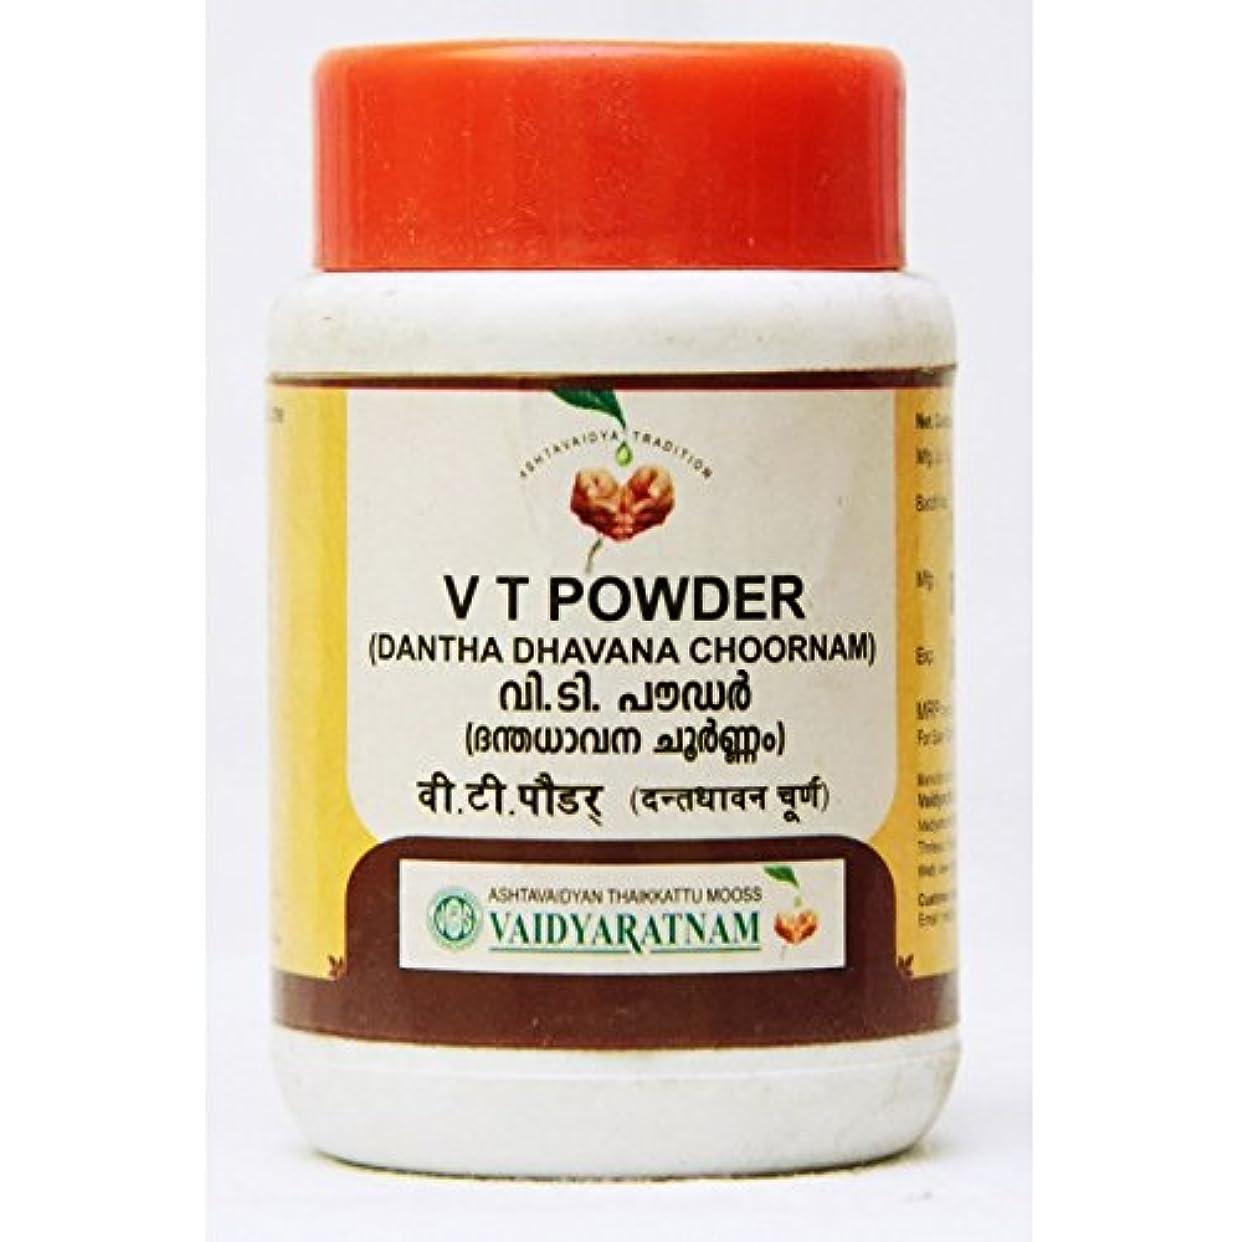 Ayurvedic Vaidyaratnam Tooth Powder ( V T Powder )